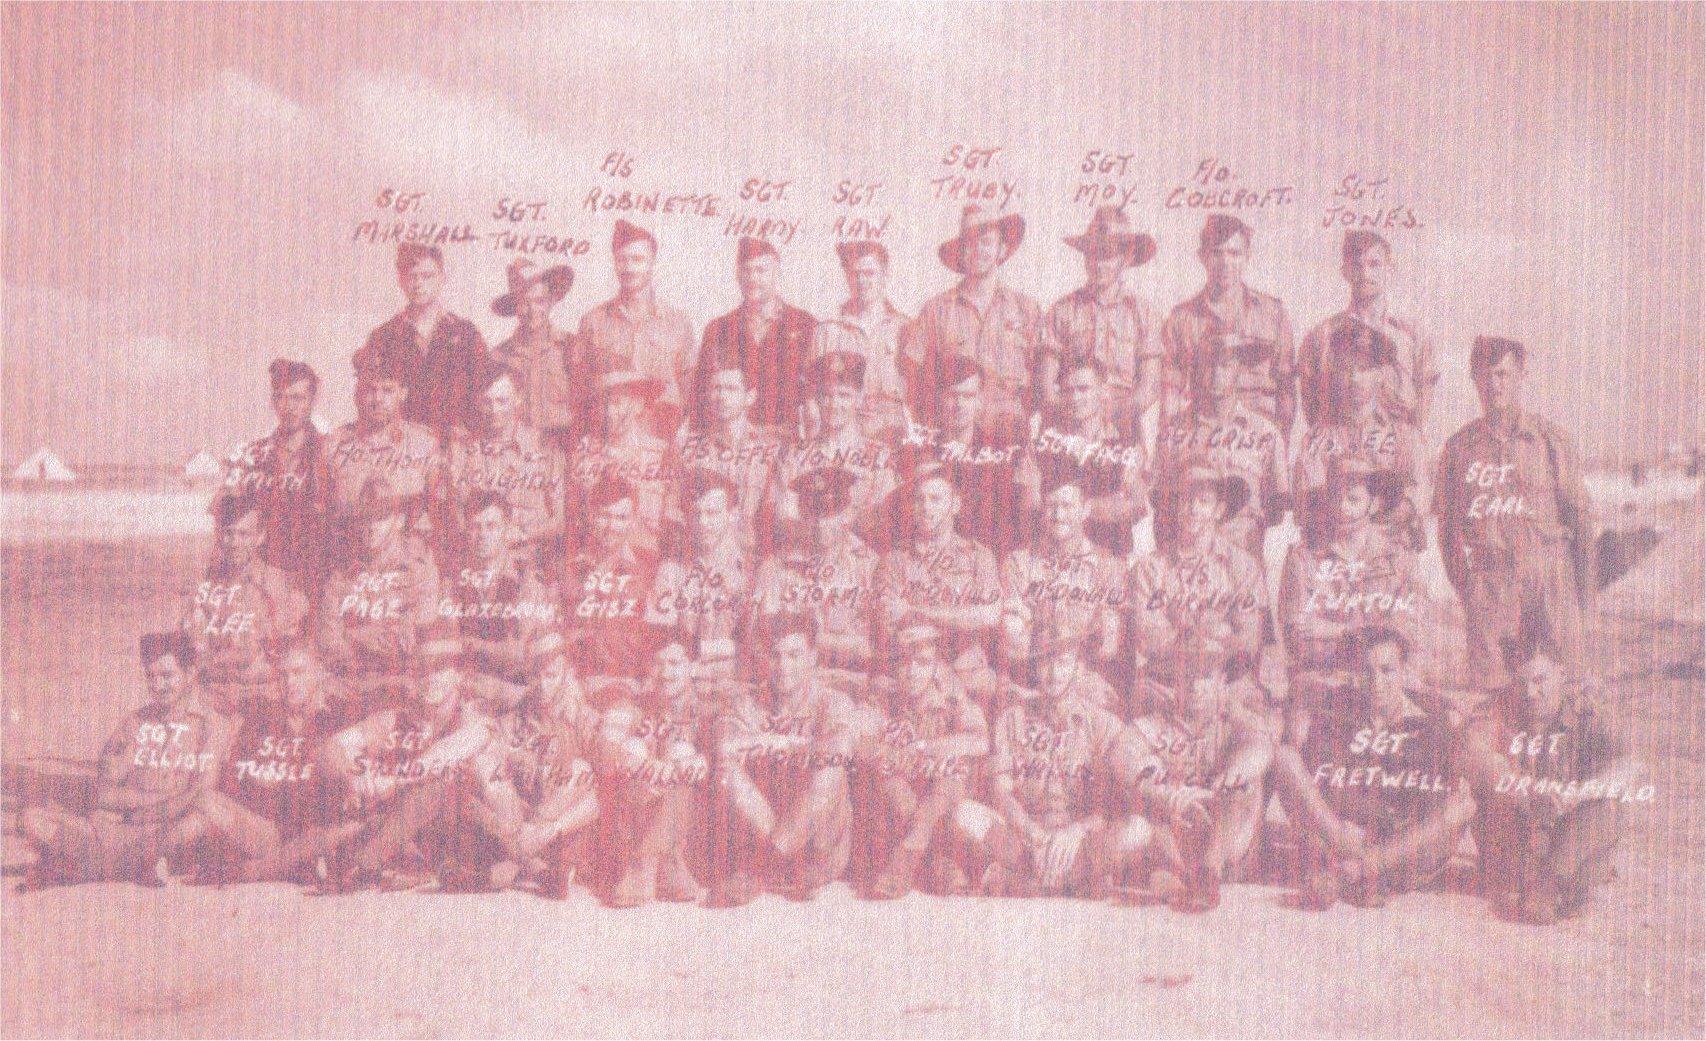 459 Senior NCOs 1943